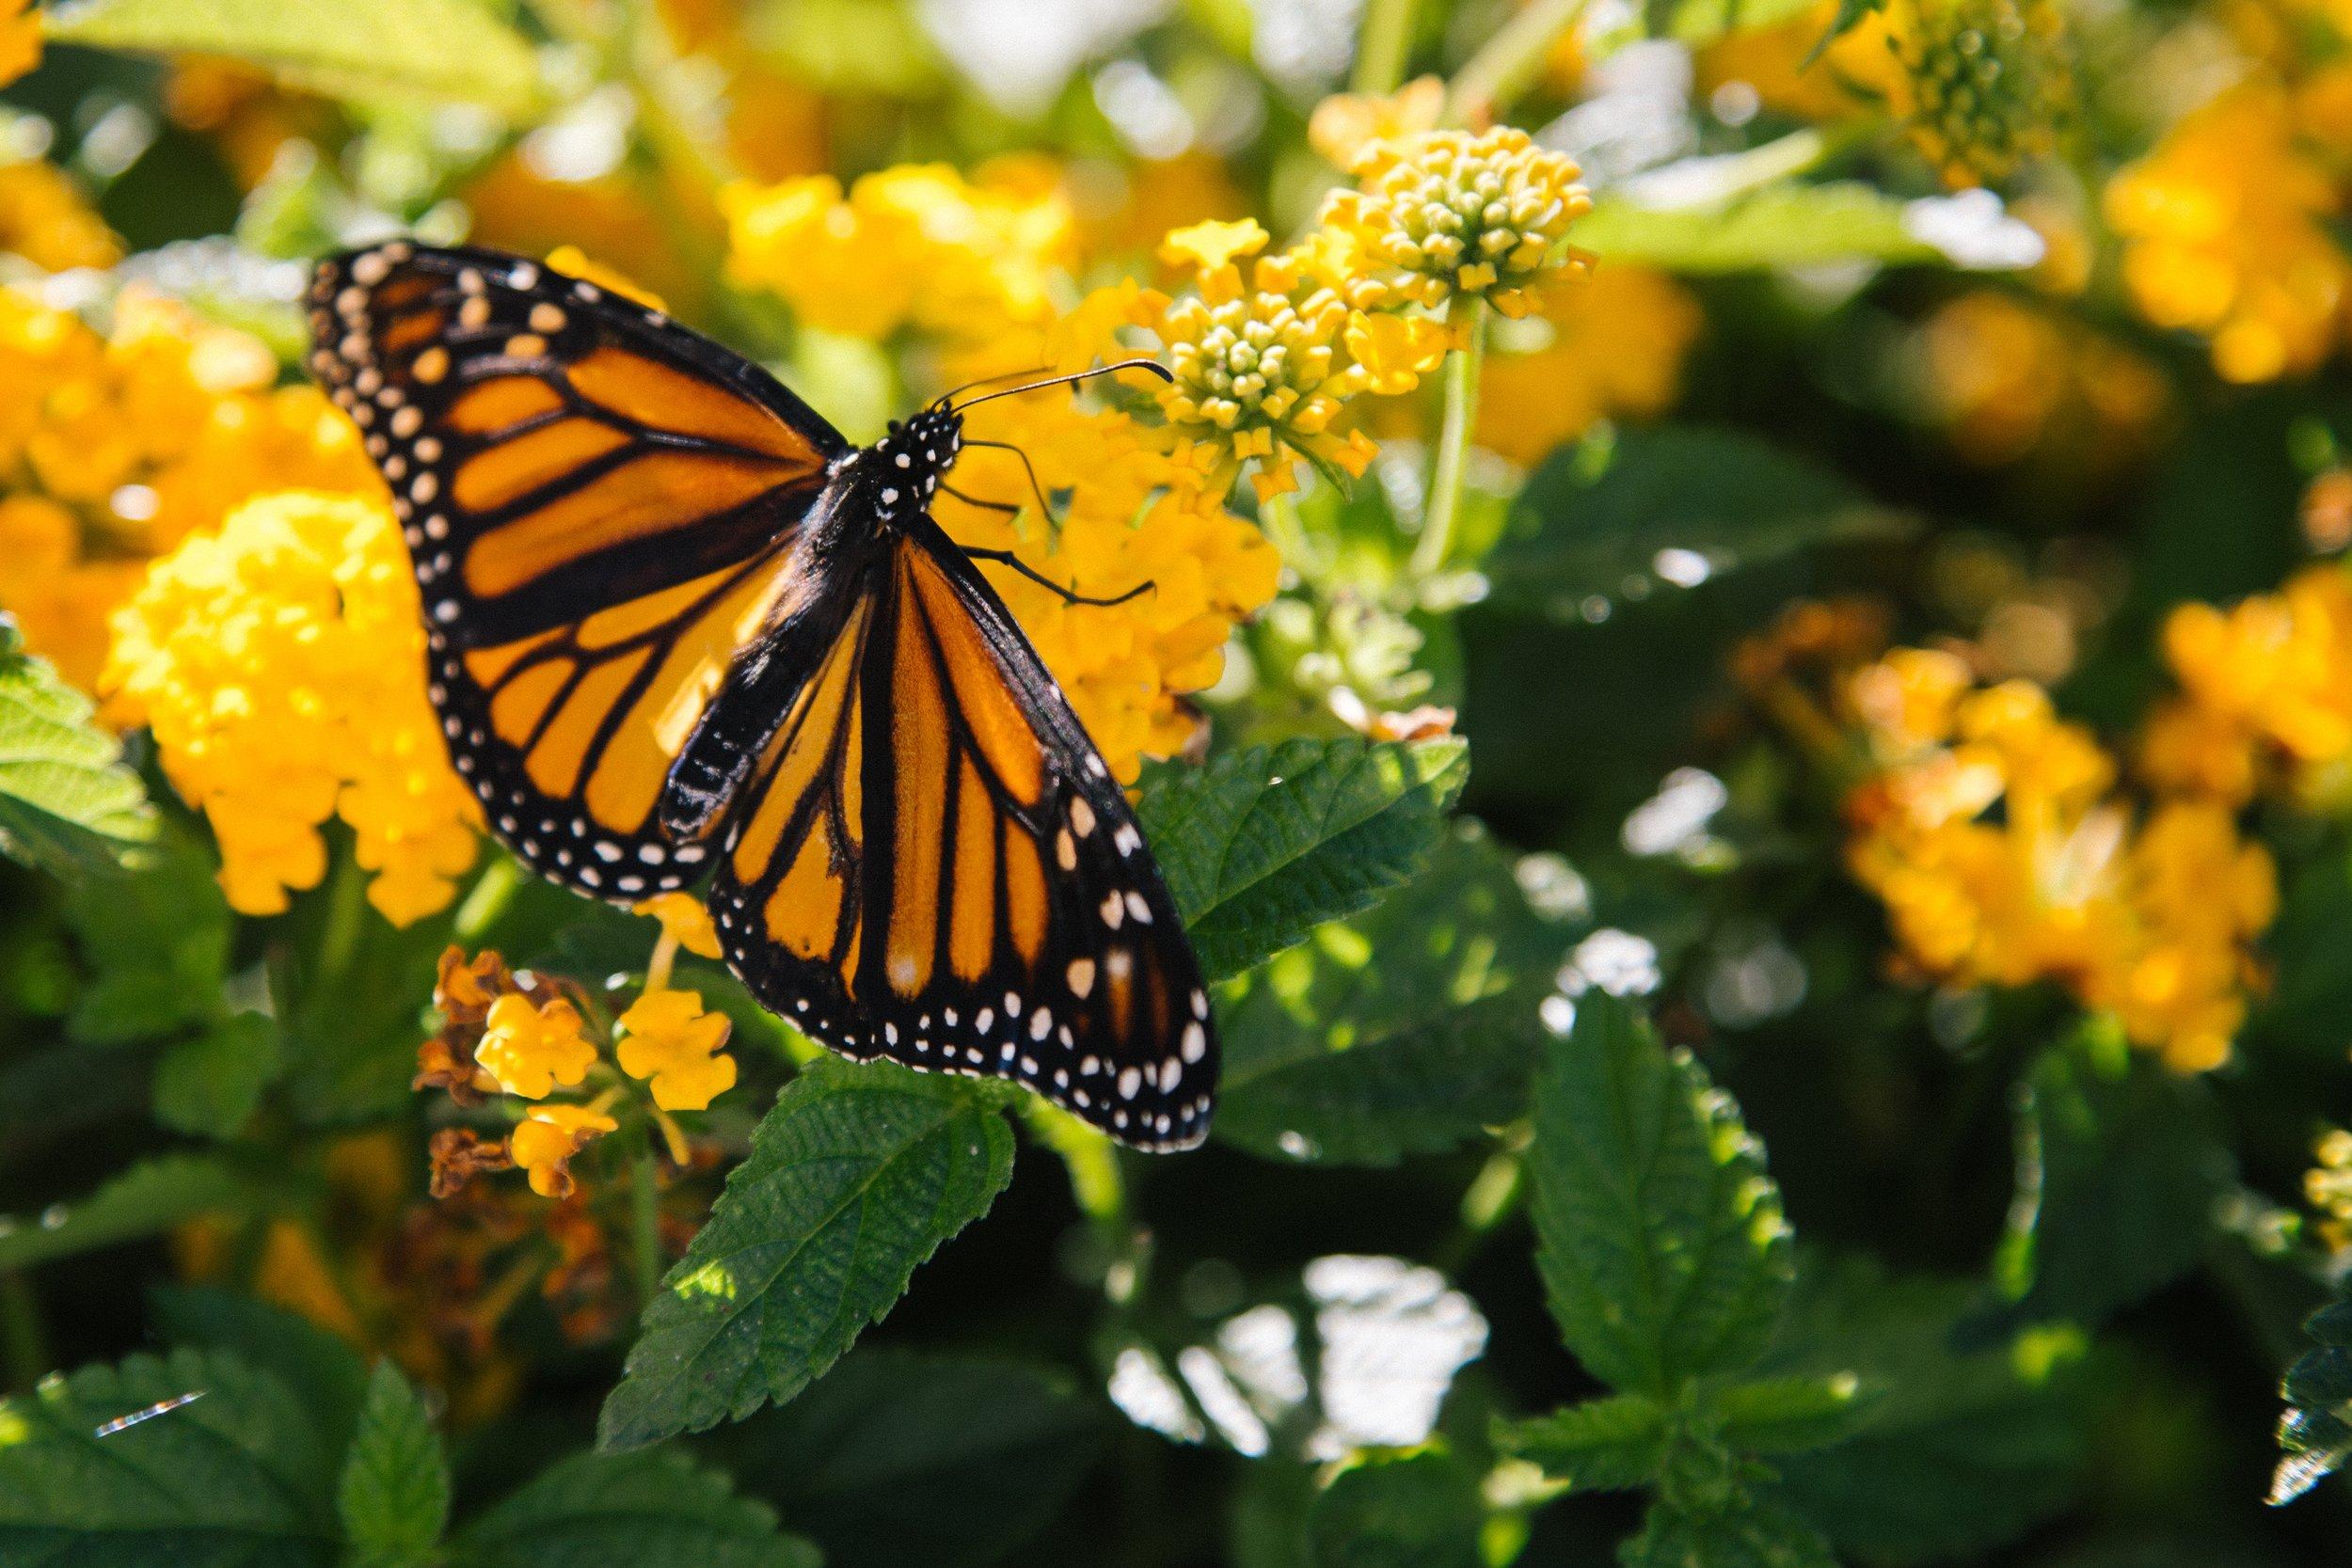 butterfly change kyle-glenn-397108-unsplash.jpg